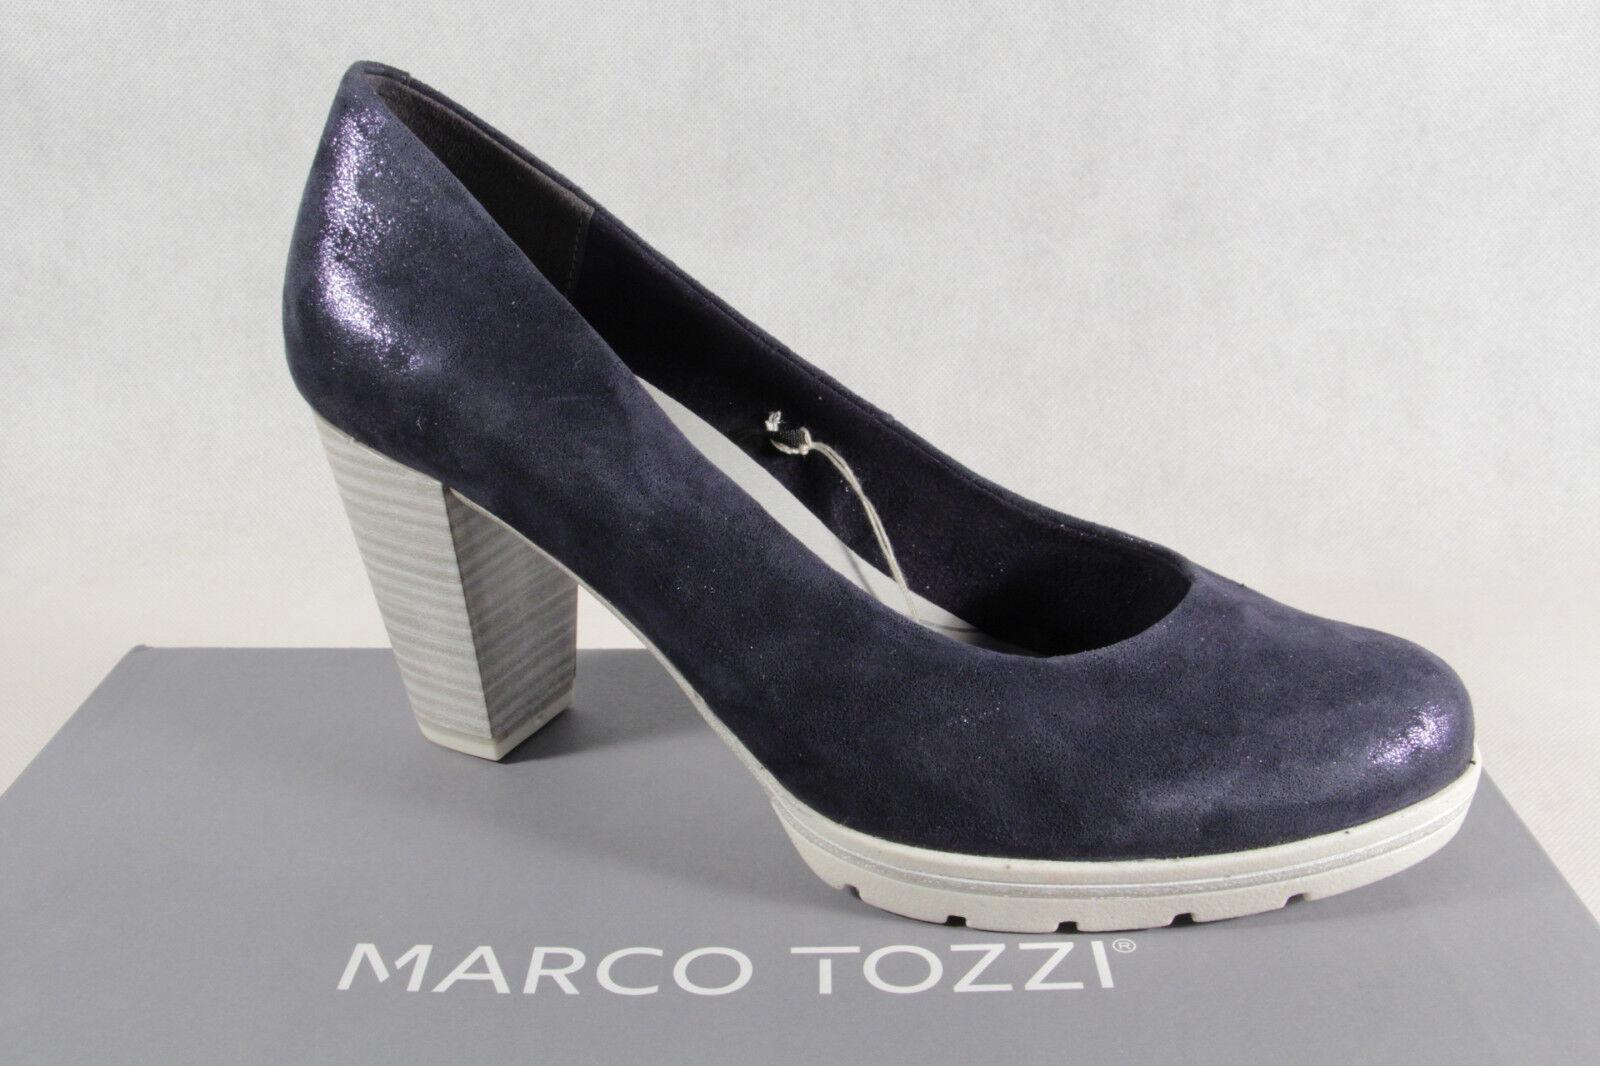 Marco Tozzi Pumps Ballerina 22437 Slipper blau weiche Innensohle Echtleder 22437 Ballerina NEU d7b117